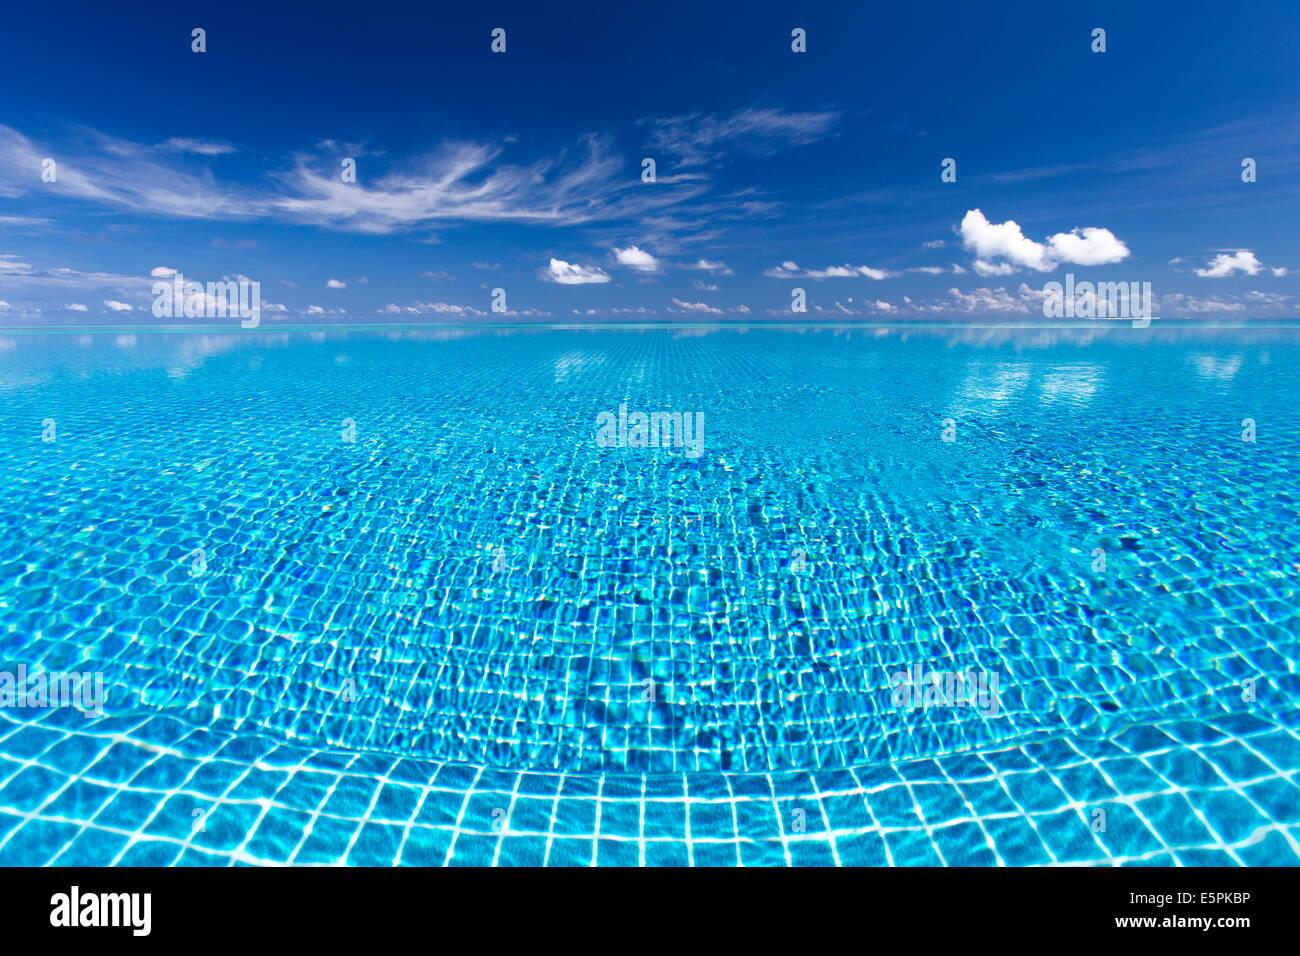 Piscina Infinity, Maldivas, Océano Índico, Asia Imagen De Stock